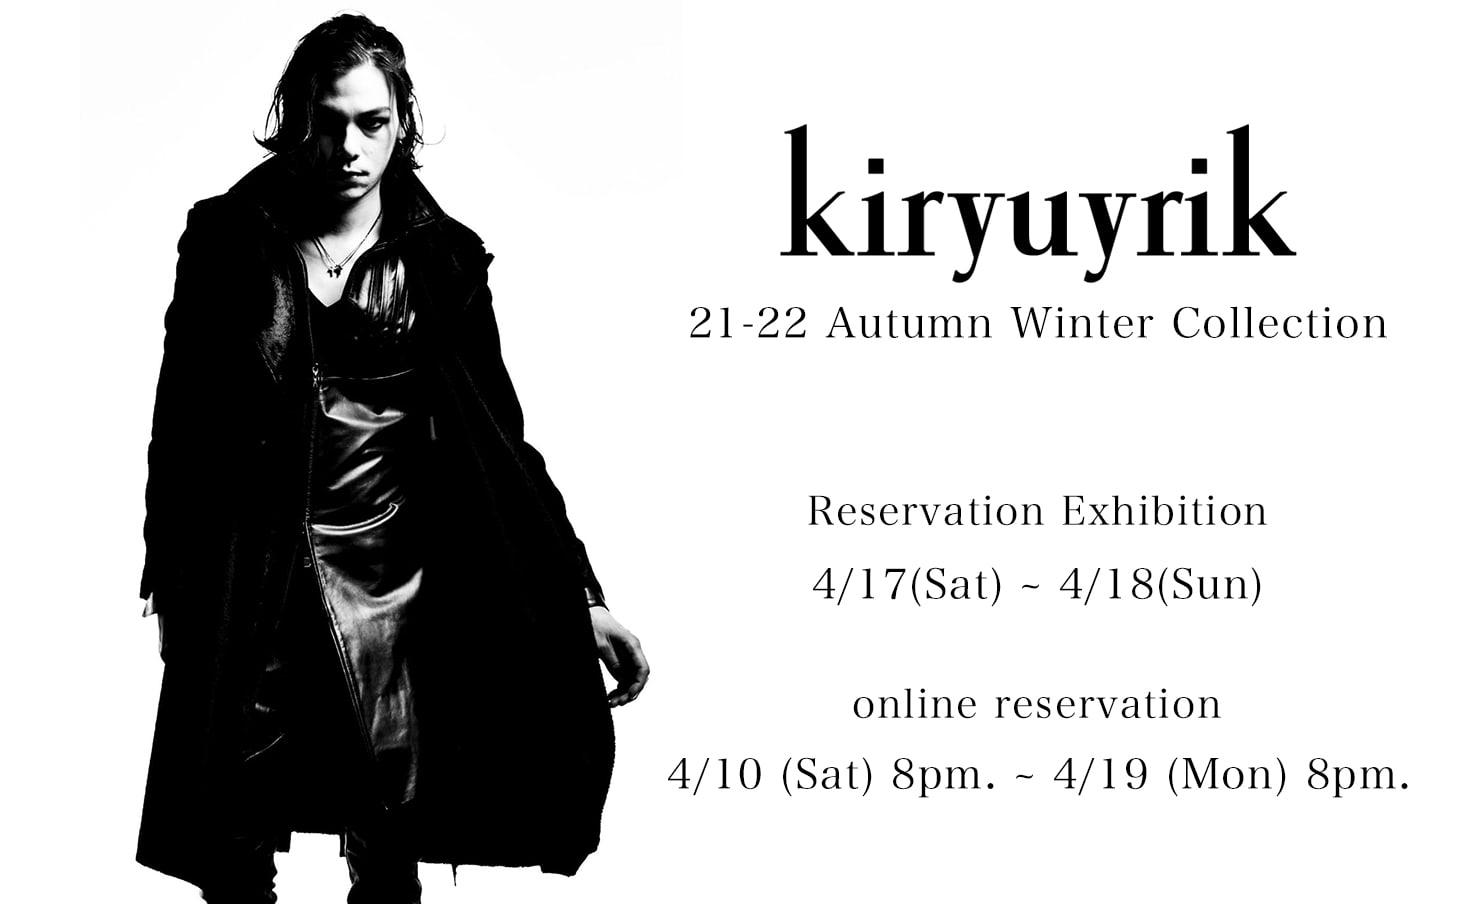 kiryuyrik 21-22AW Collection Reservation